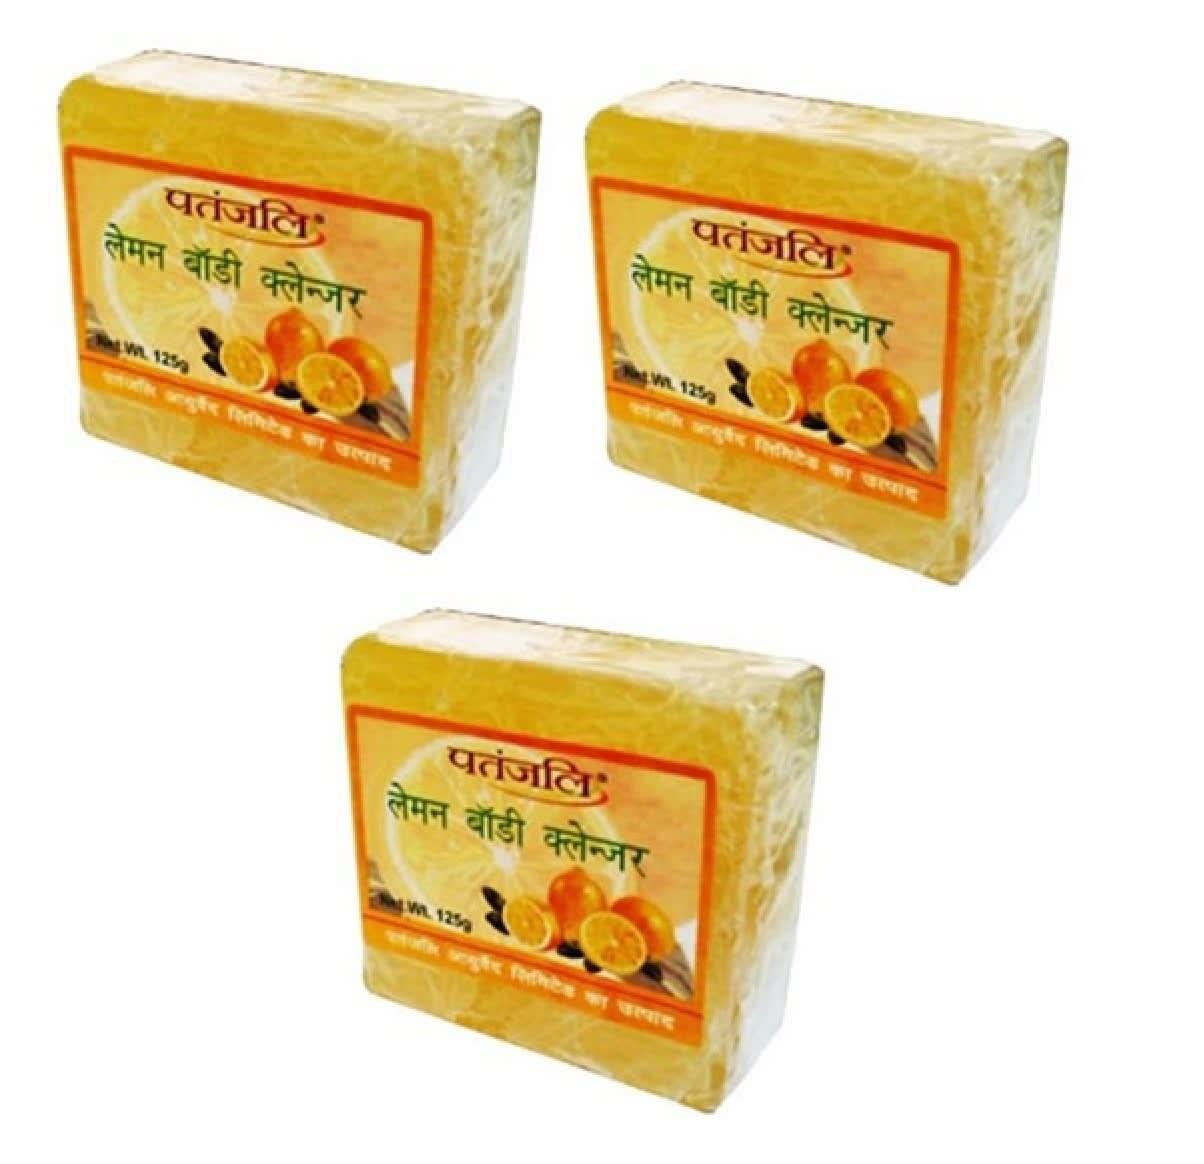 Patanjali Ayurveda Lemon Body Cleanser Pack of 3